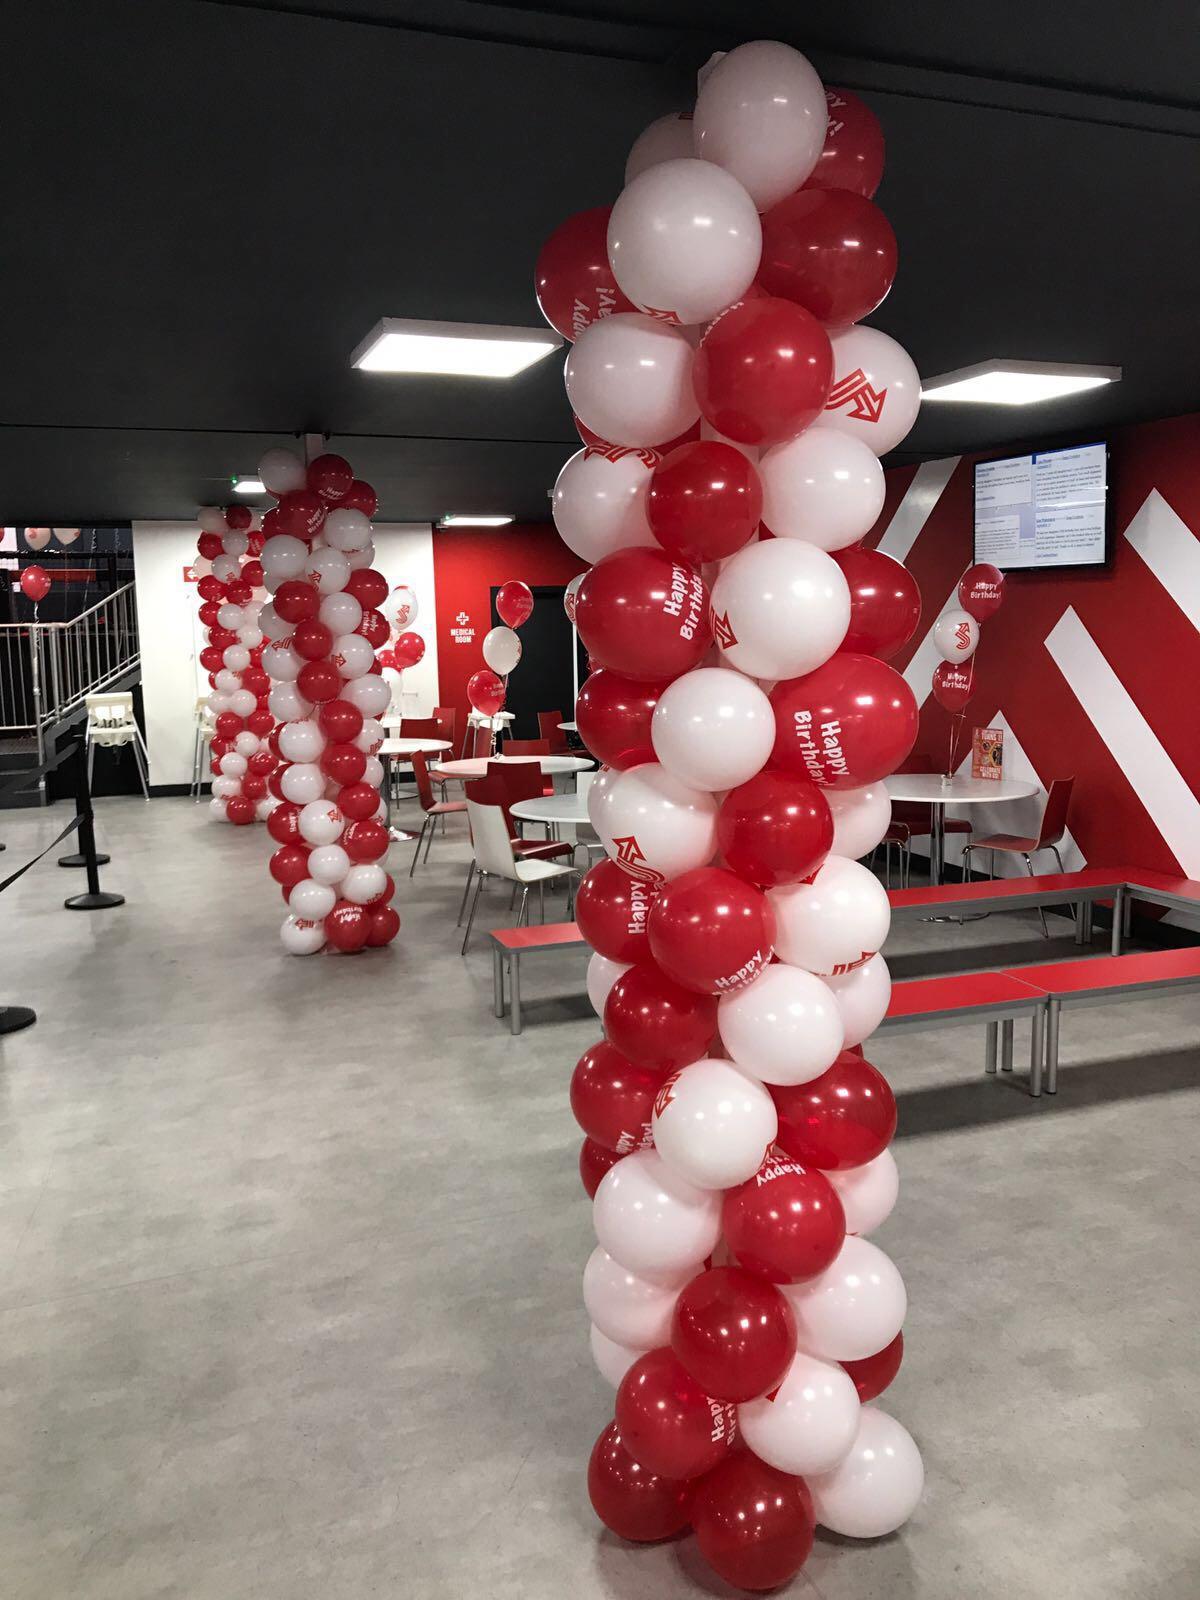 Fantastic Balloons & Decorations